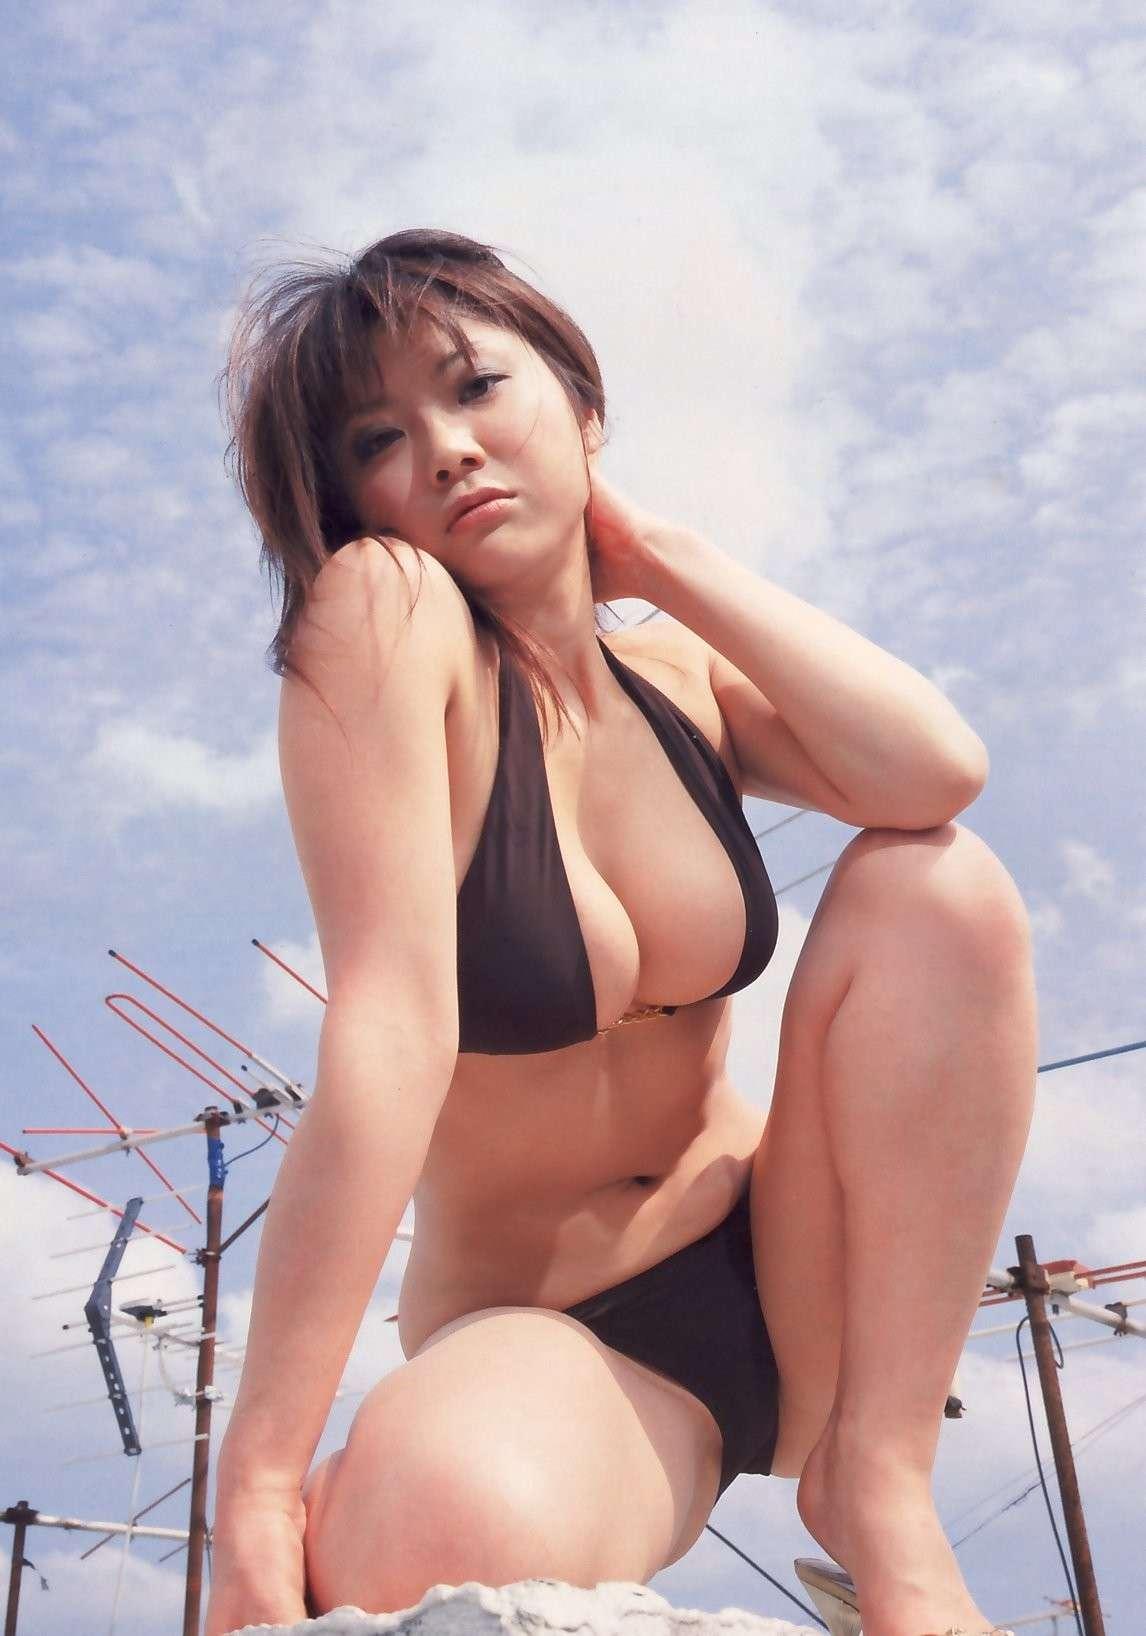 http://blog.cnobi.jp/v1/blog/user/a8c5c06266ed65ea9b67299e90592fa7/1328398404